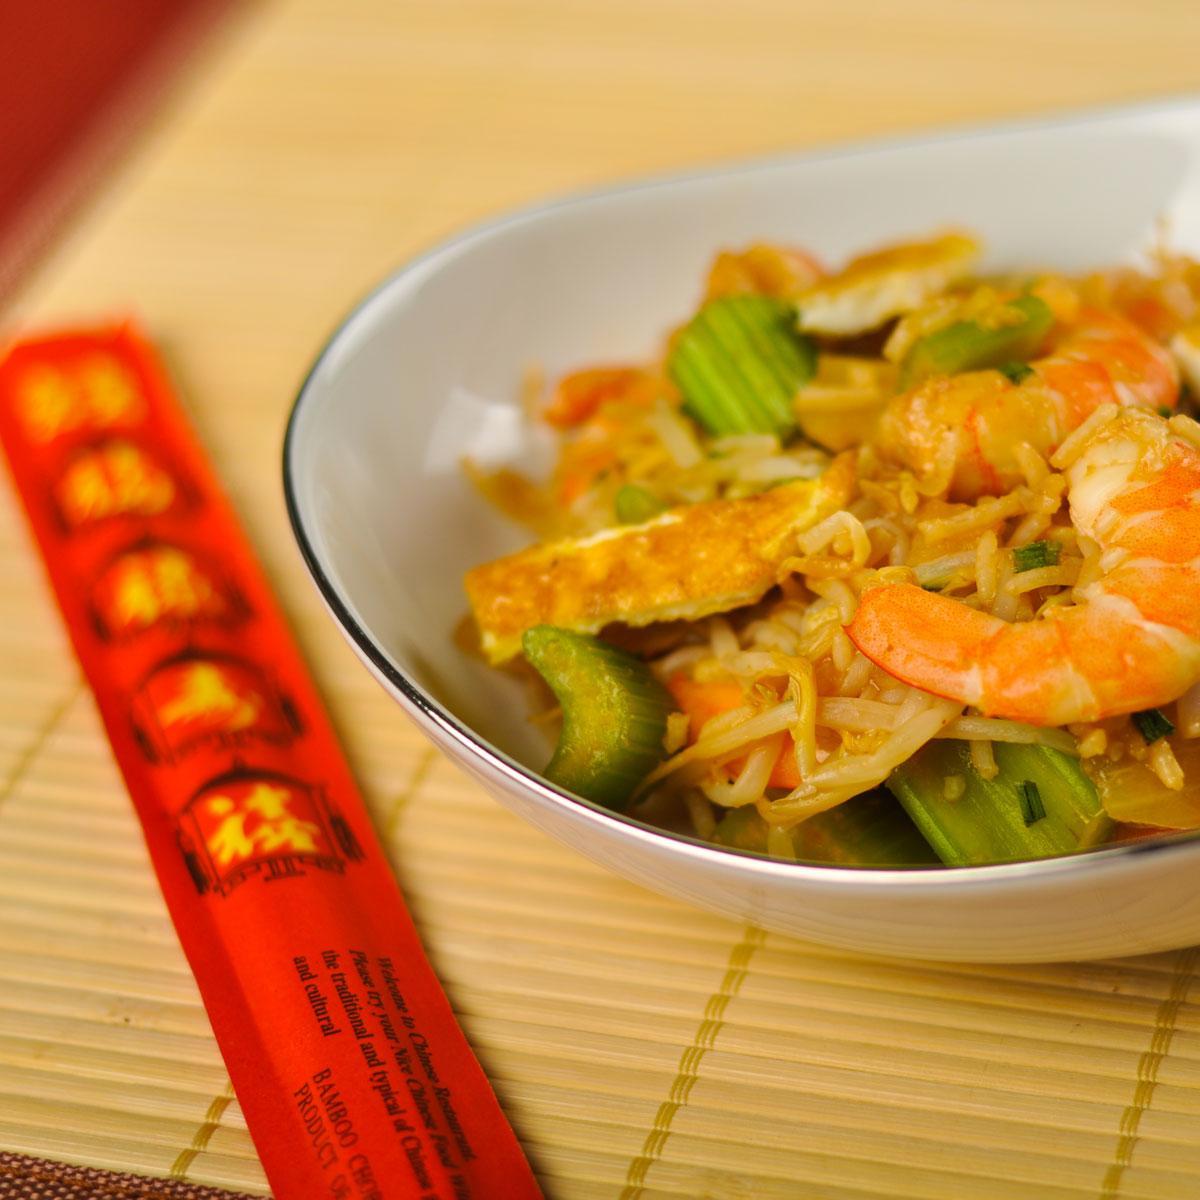 recette crevettes saut es la chinoise cuisine madame figaro. Black Bedroom Furniture Sets. Home Design Ideas